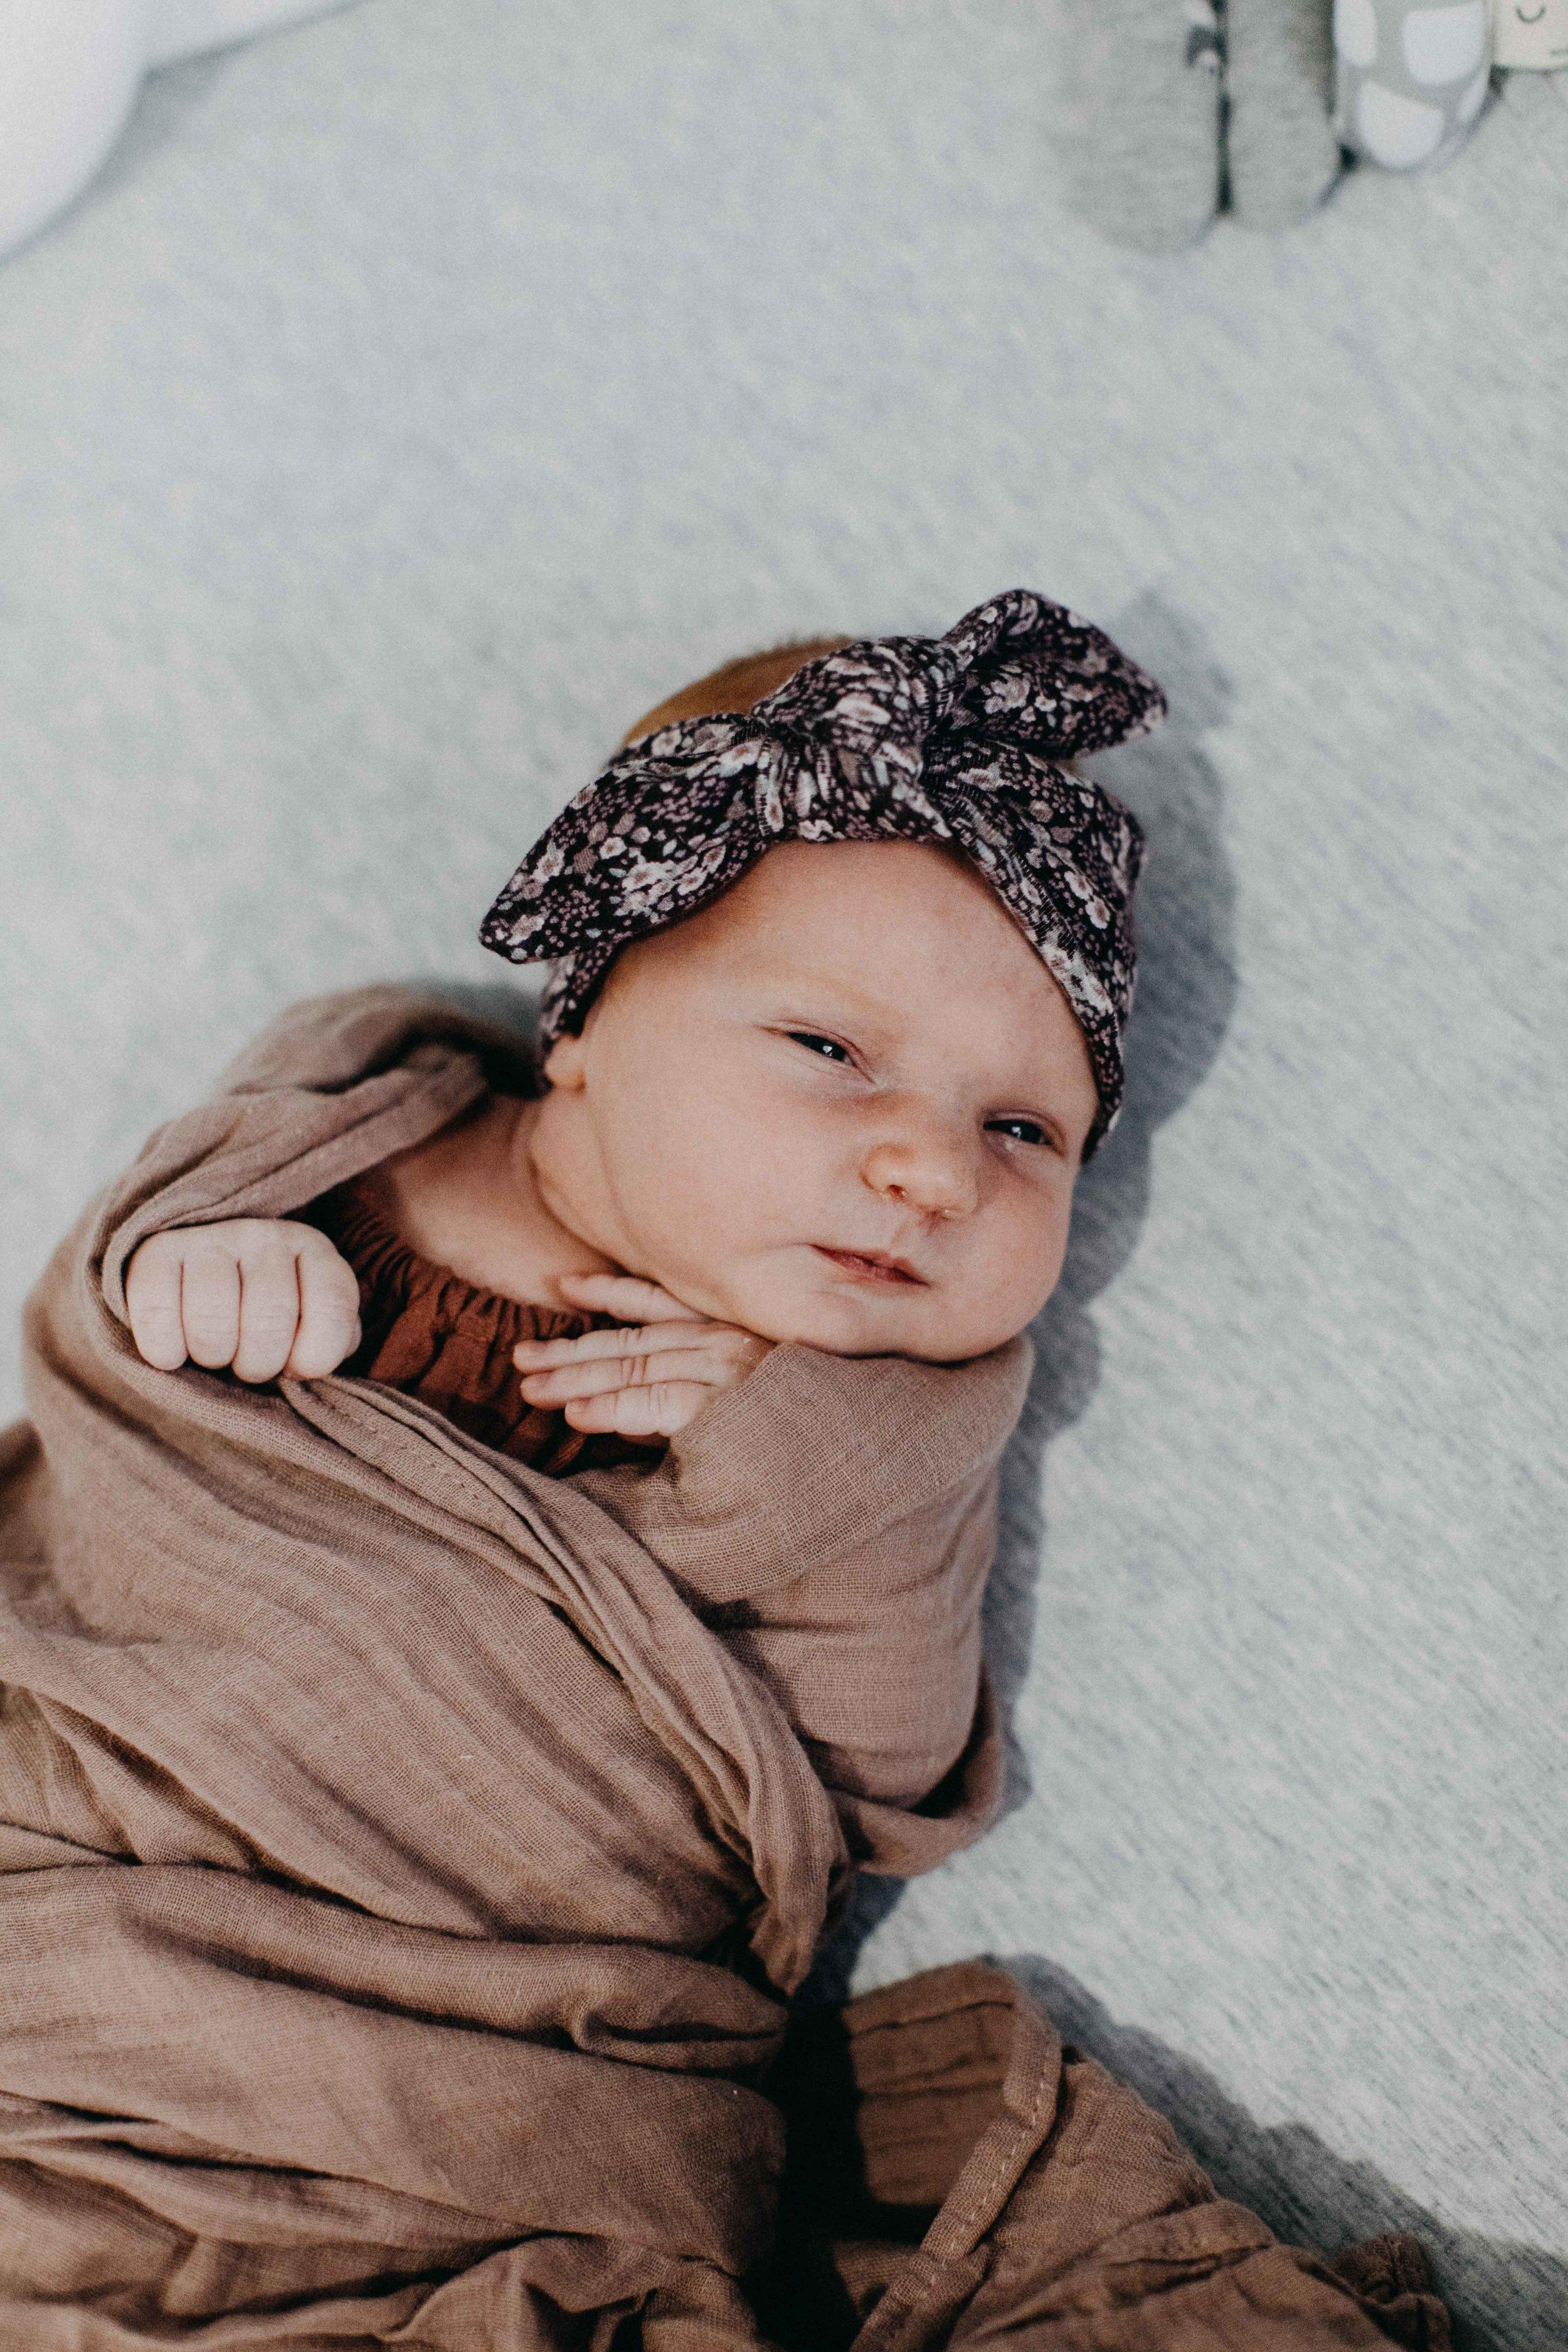 picton-newborn-photography-www.emilyobrienphotography.net-macarthur-wollondilly-arlo-21.jpg